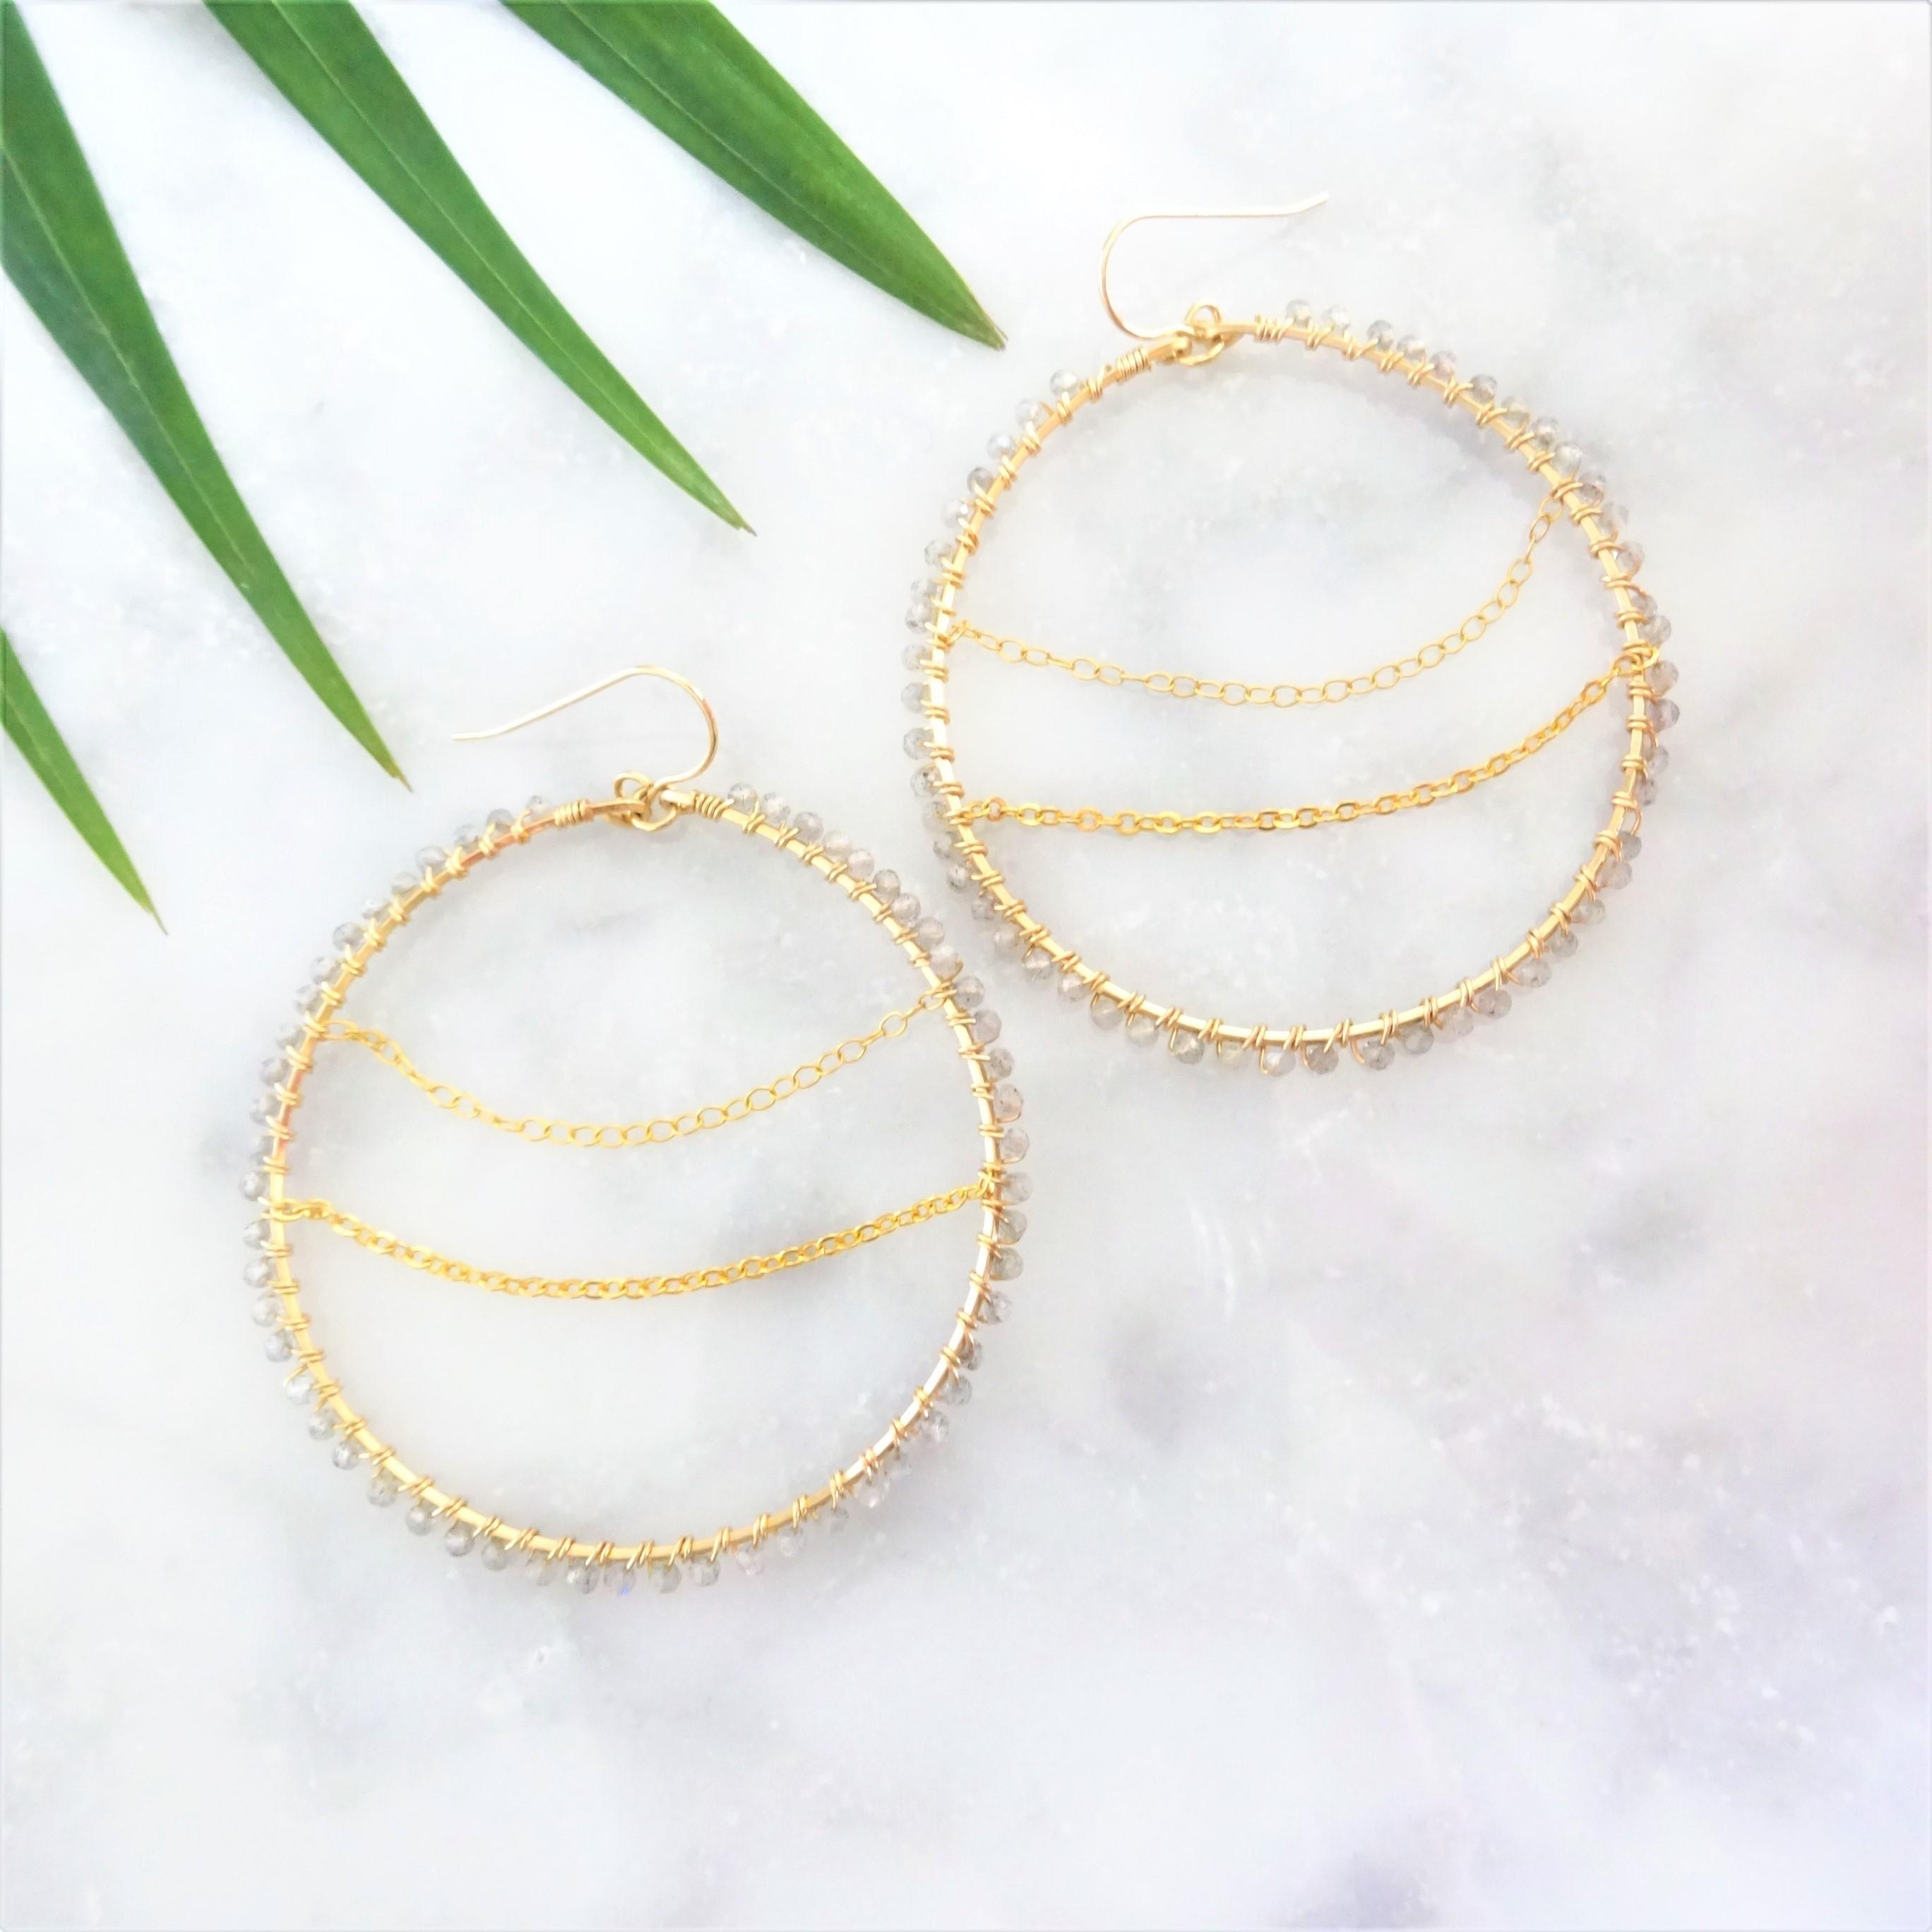 送料無料 14kgf Labradorite♡wrapped chain pierced earring/earring